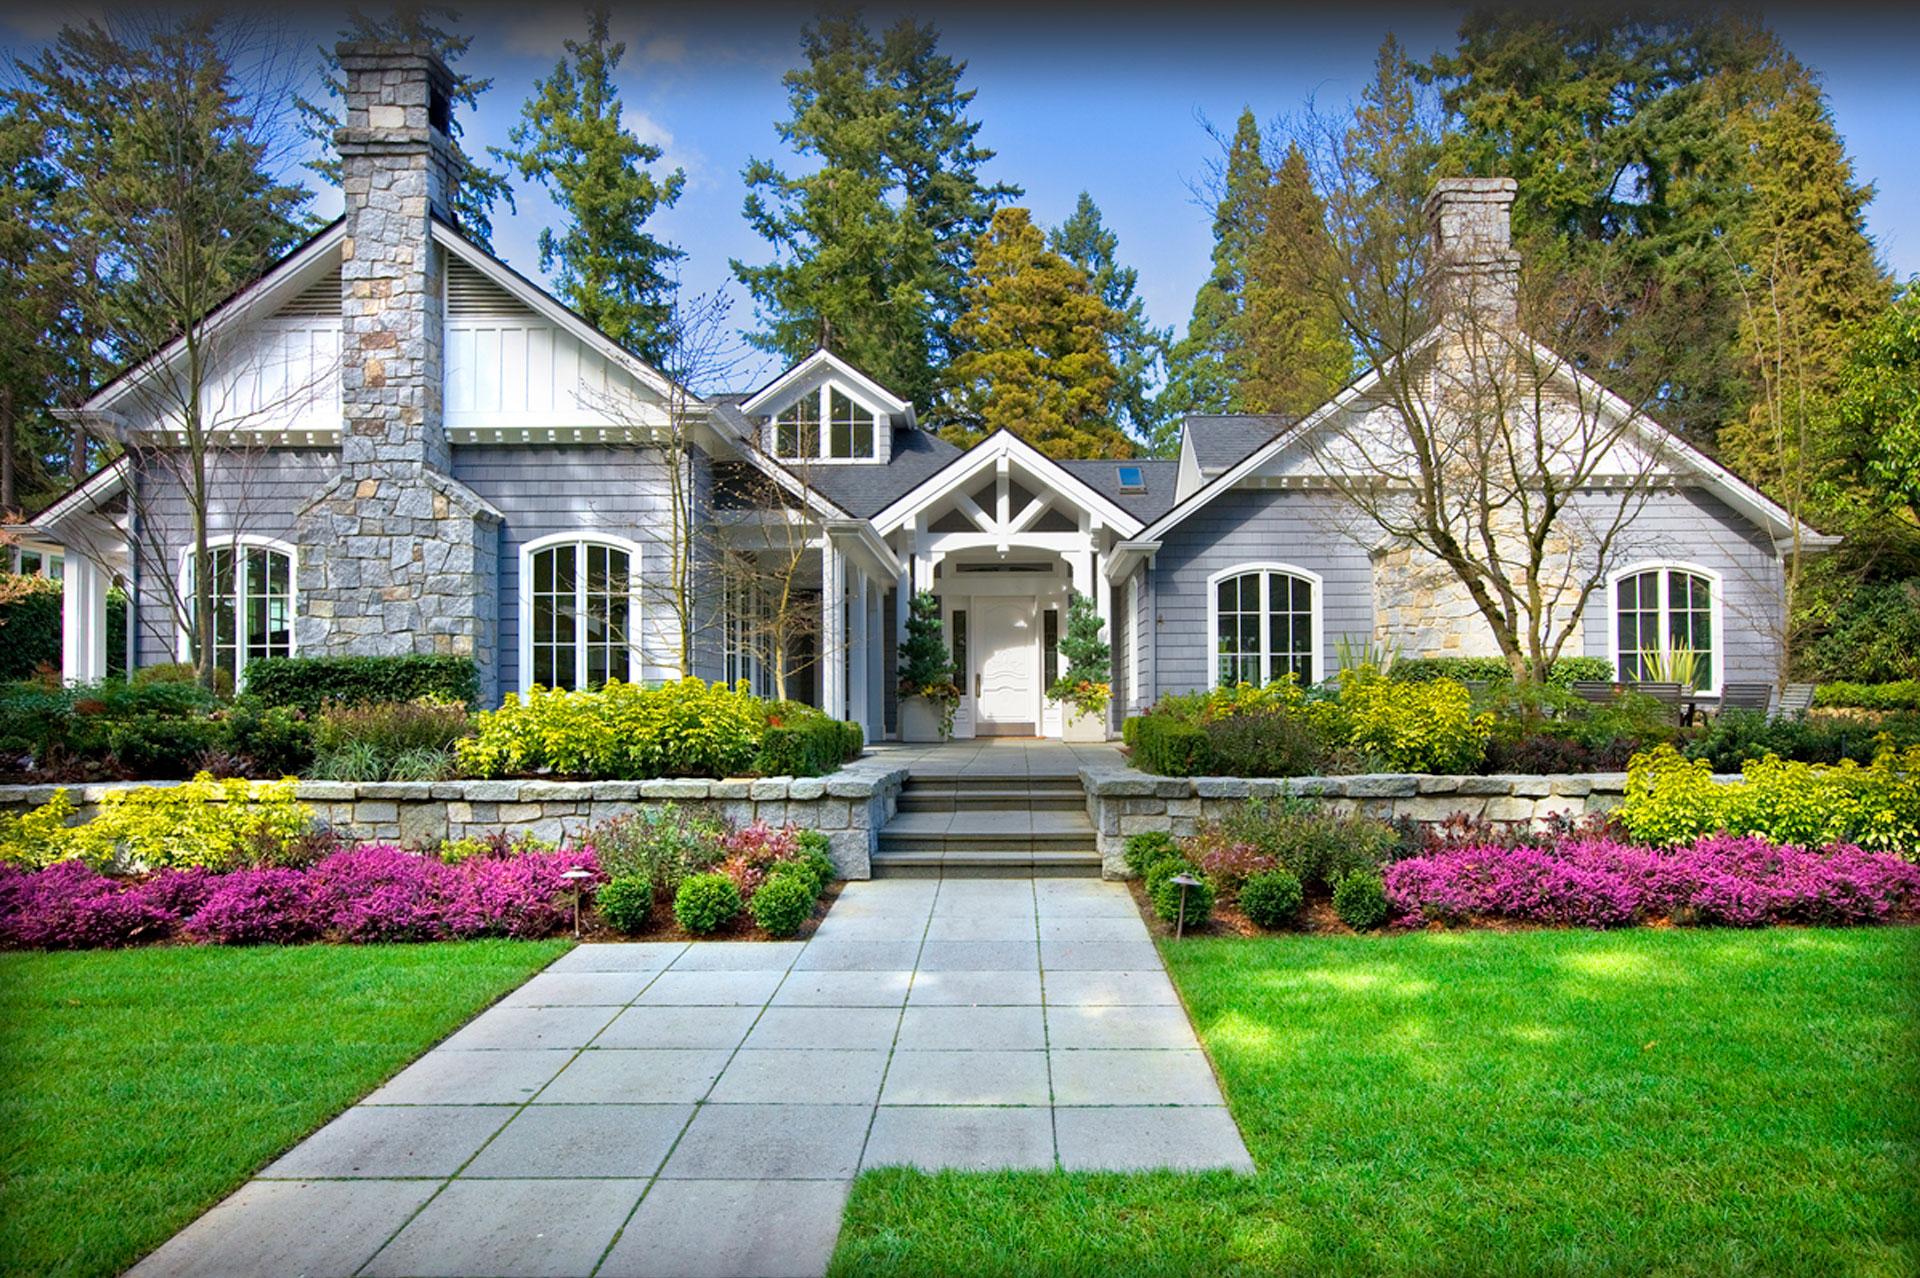 Design Guild Homes. Cape Cod inpiration custom built home.